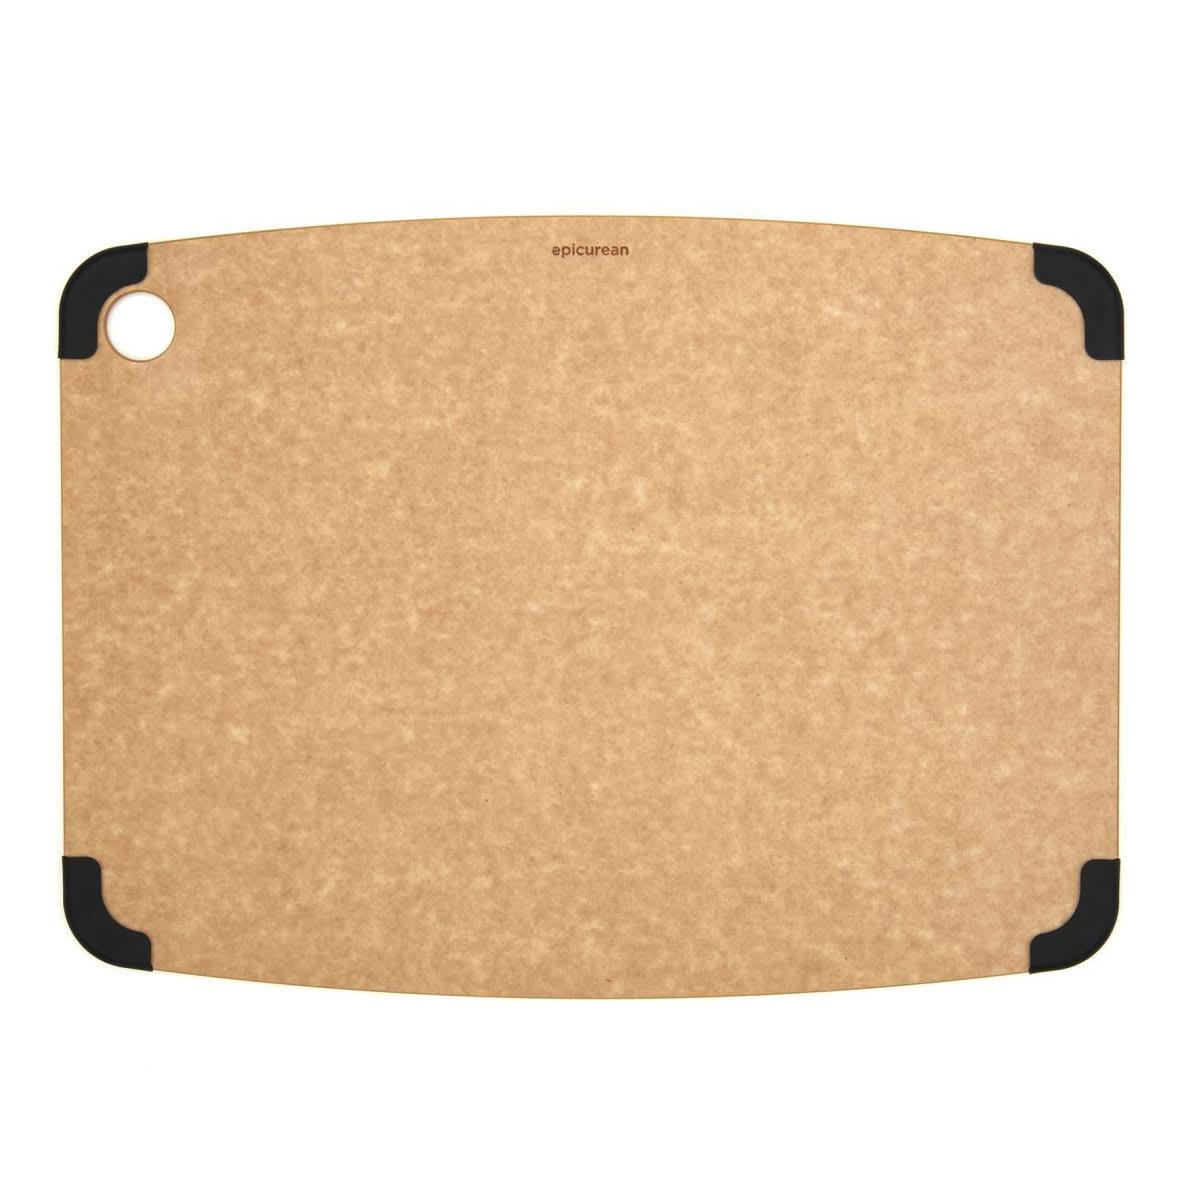 "Epicurean 202-18130103 Non Slip Cutting Board, 17.5x13"", Natural/Slate"